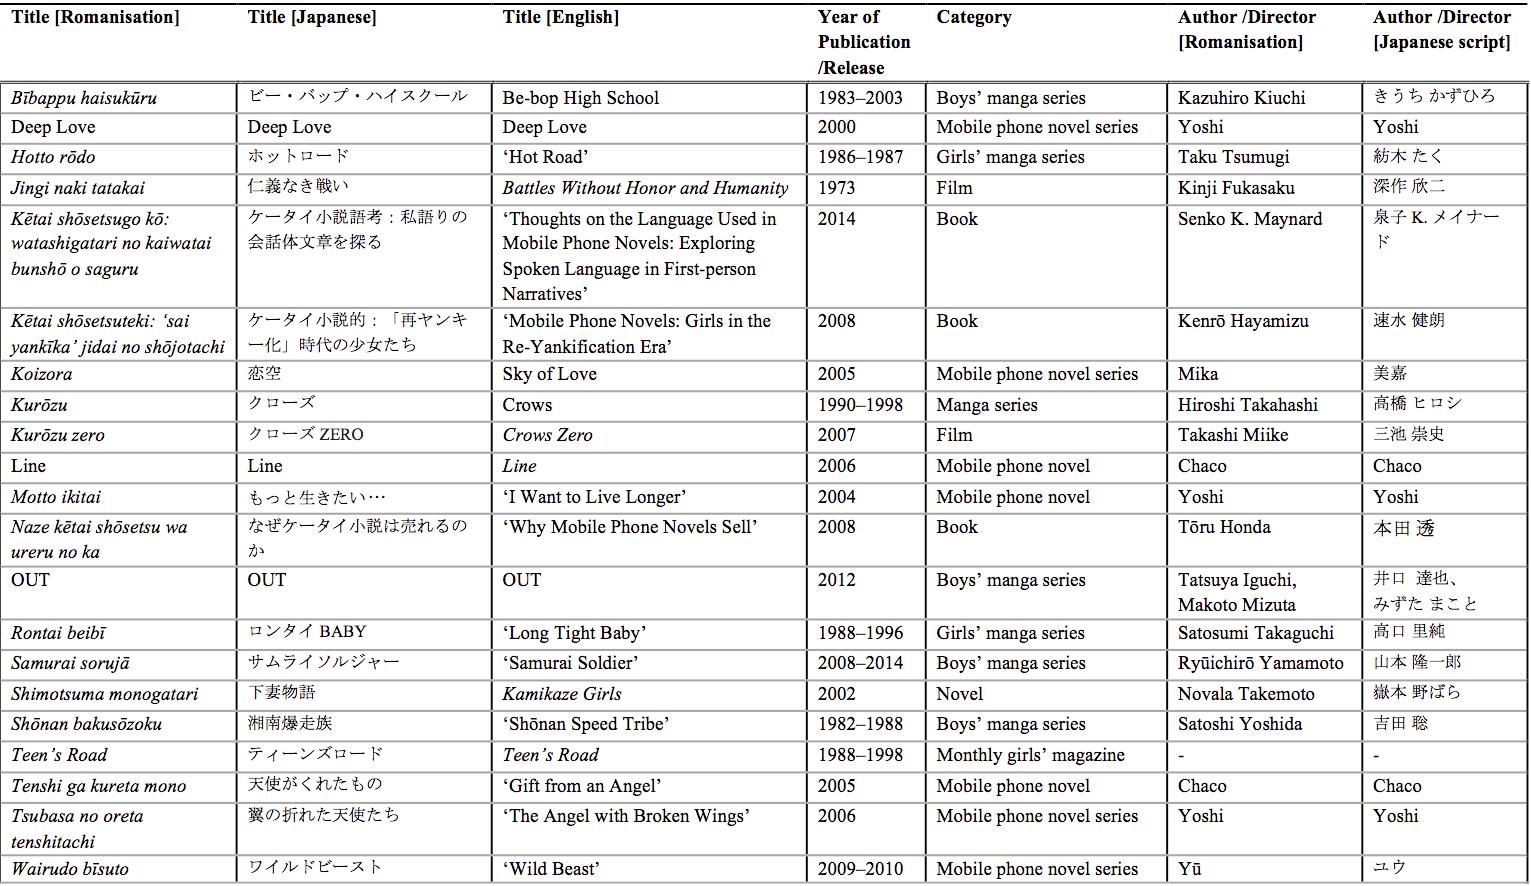 nv9-kim-appendix-bibliography